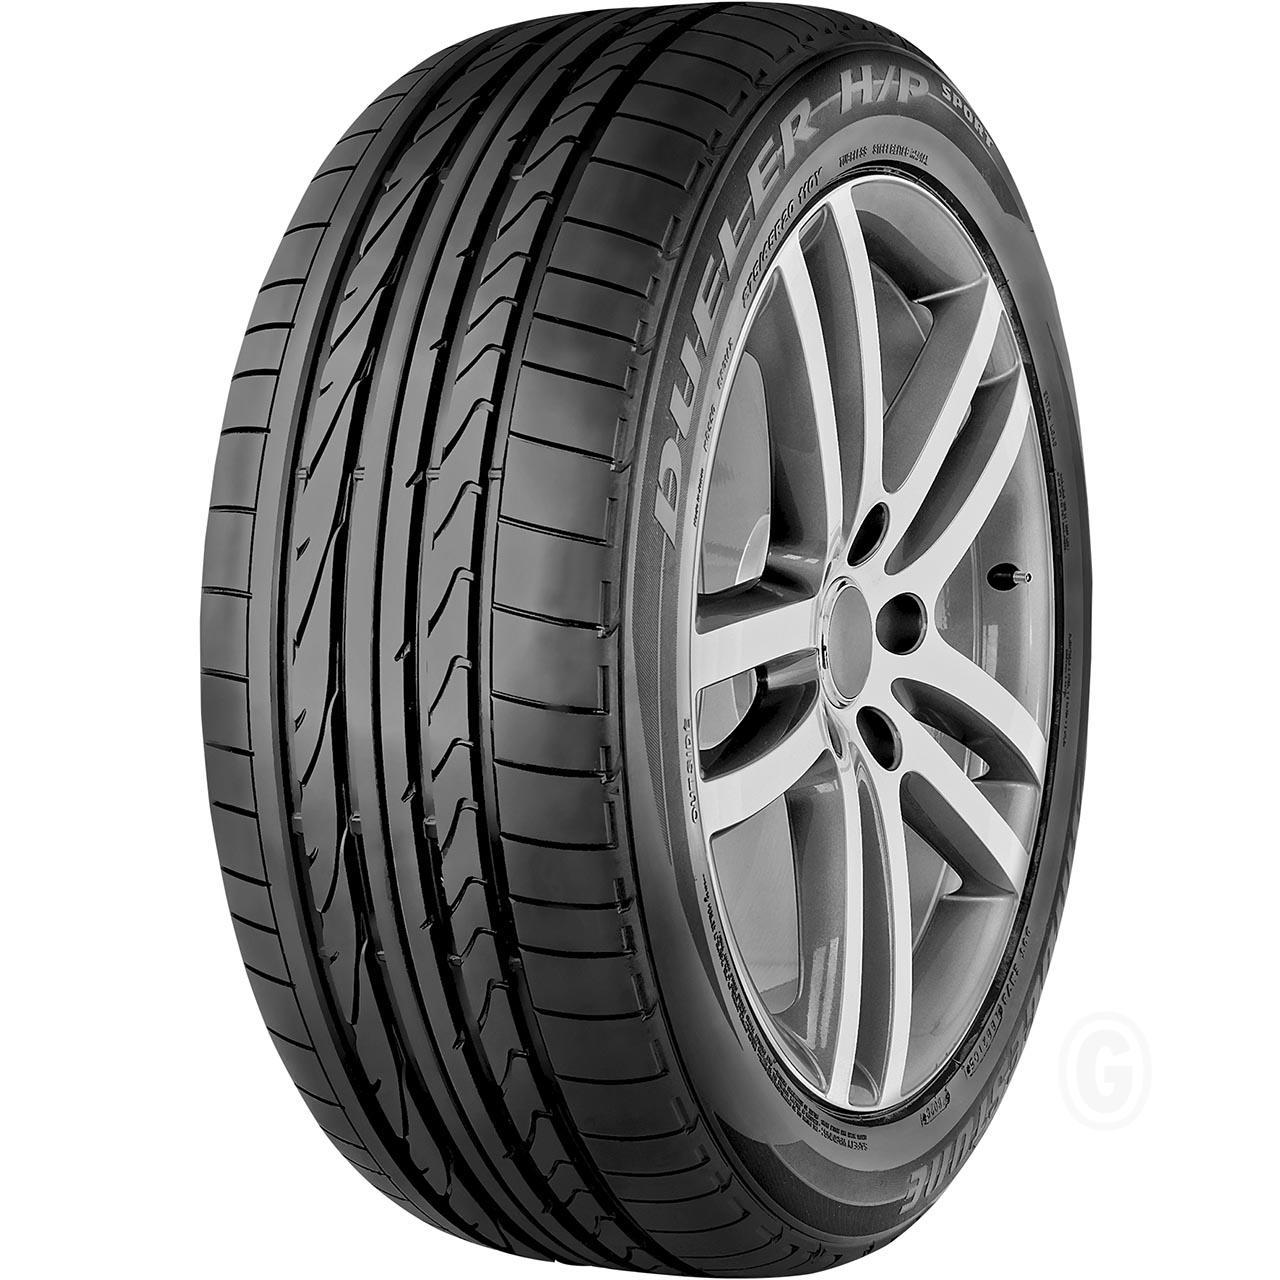 Bridgestone Dueler HP Sport 235/55R19 101V MO